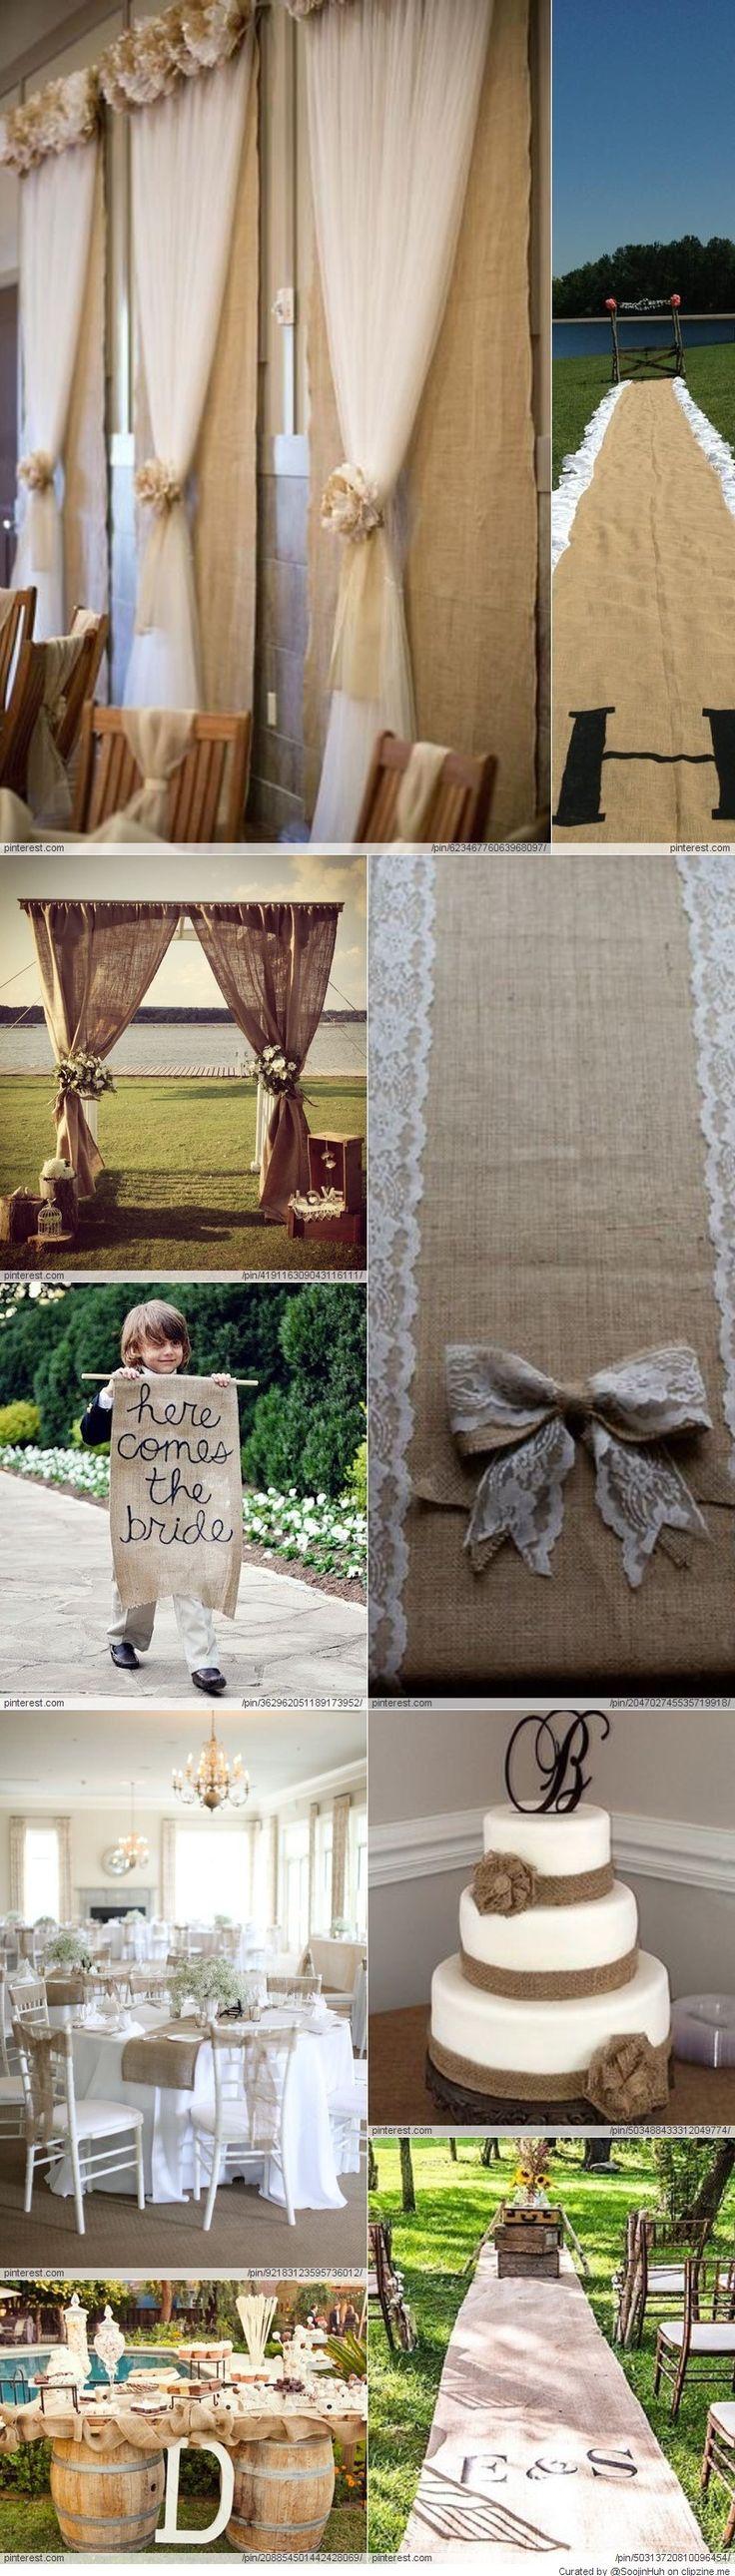 Burlap Wedding Ideas. My kind of country wedding